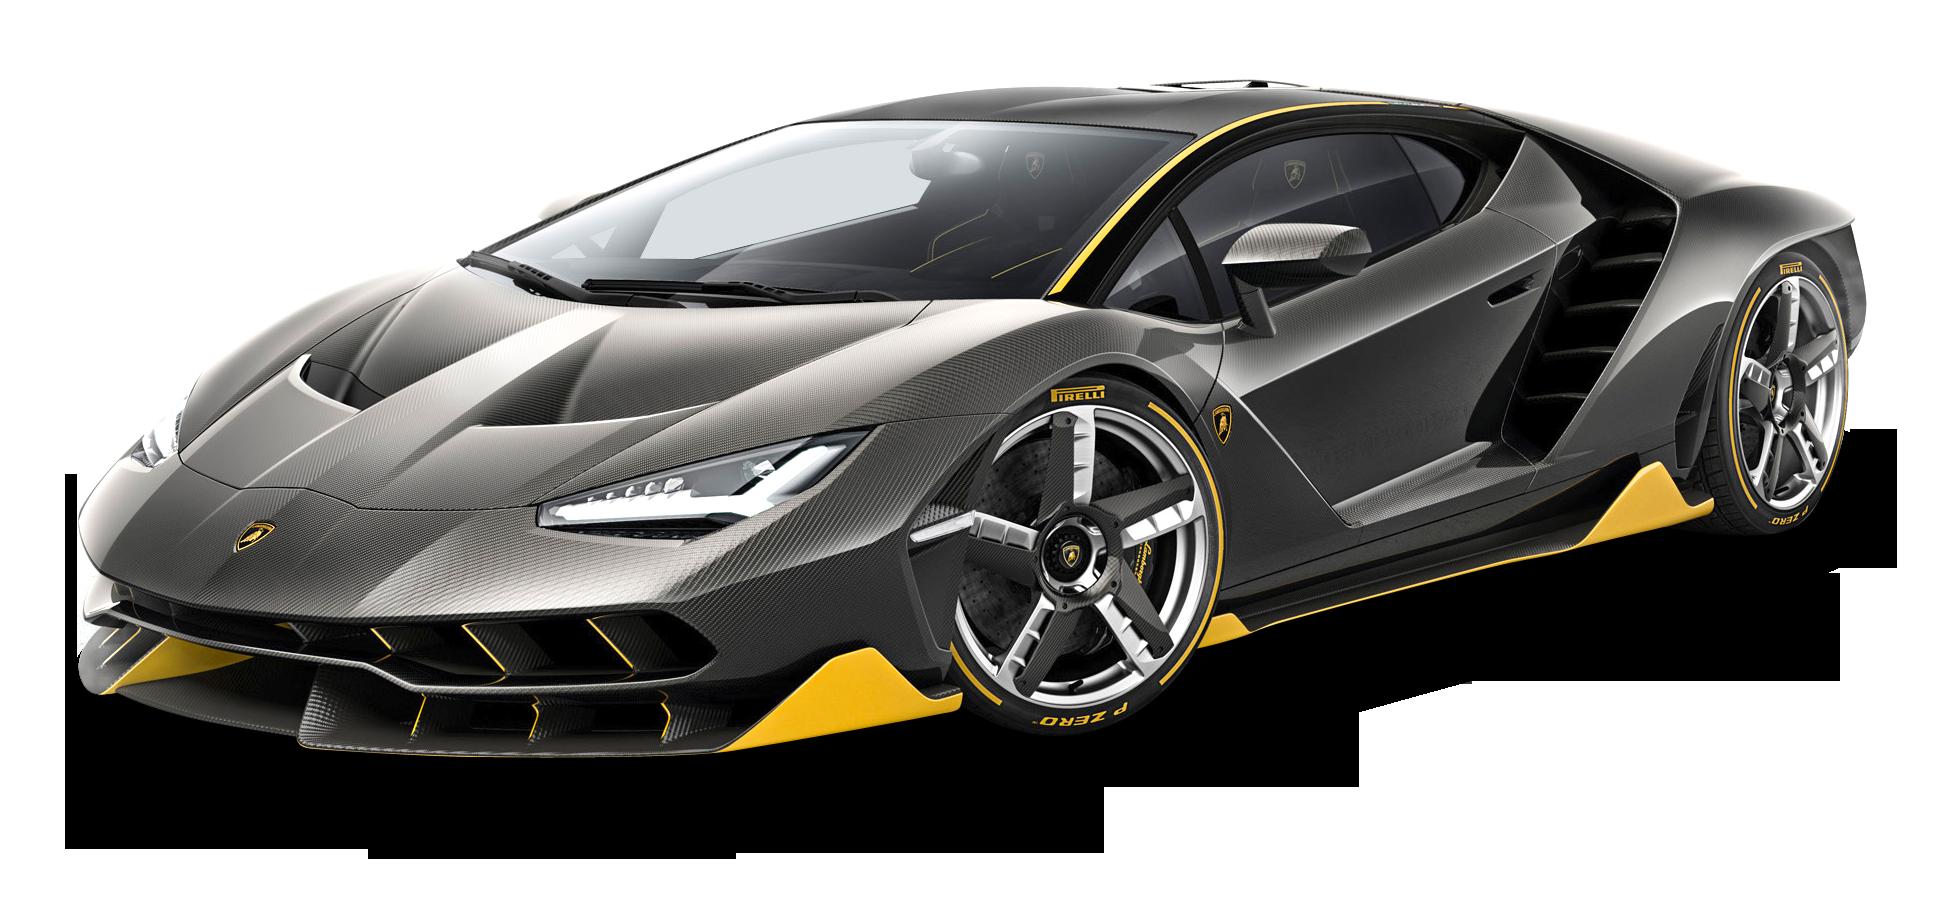 In Quality Car Styling Door Handle Protector Film Stickers For Lamborghini Aventador Centenario Huracan Murcielago Reventon Car Accessories Superior